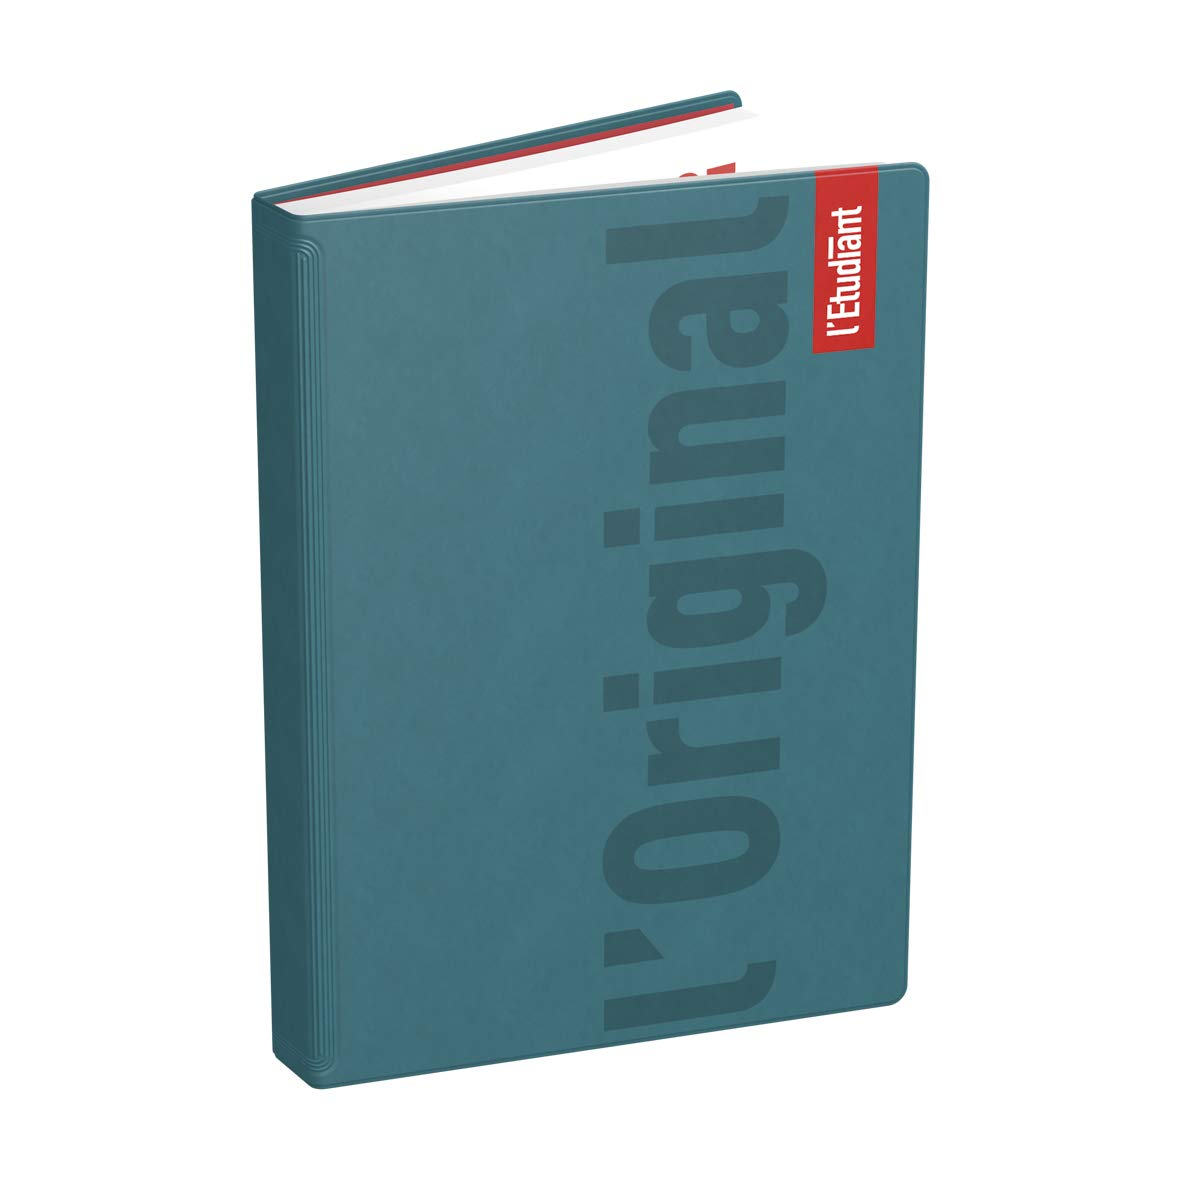 Amazon.com : LEtudiant Original - 1 Daily Academic Diary ...